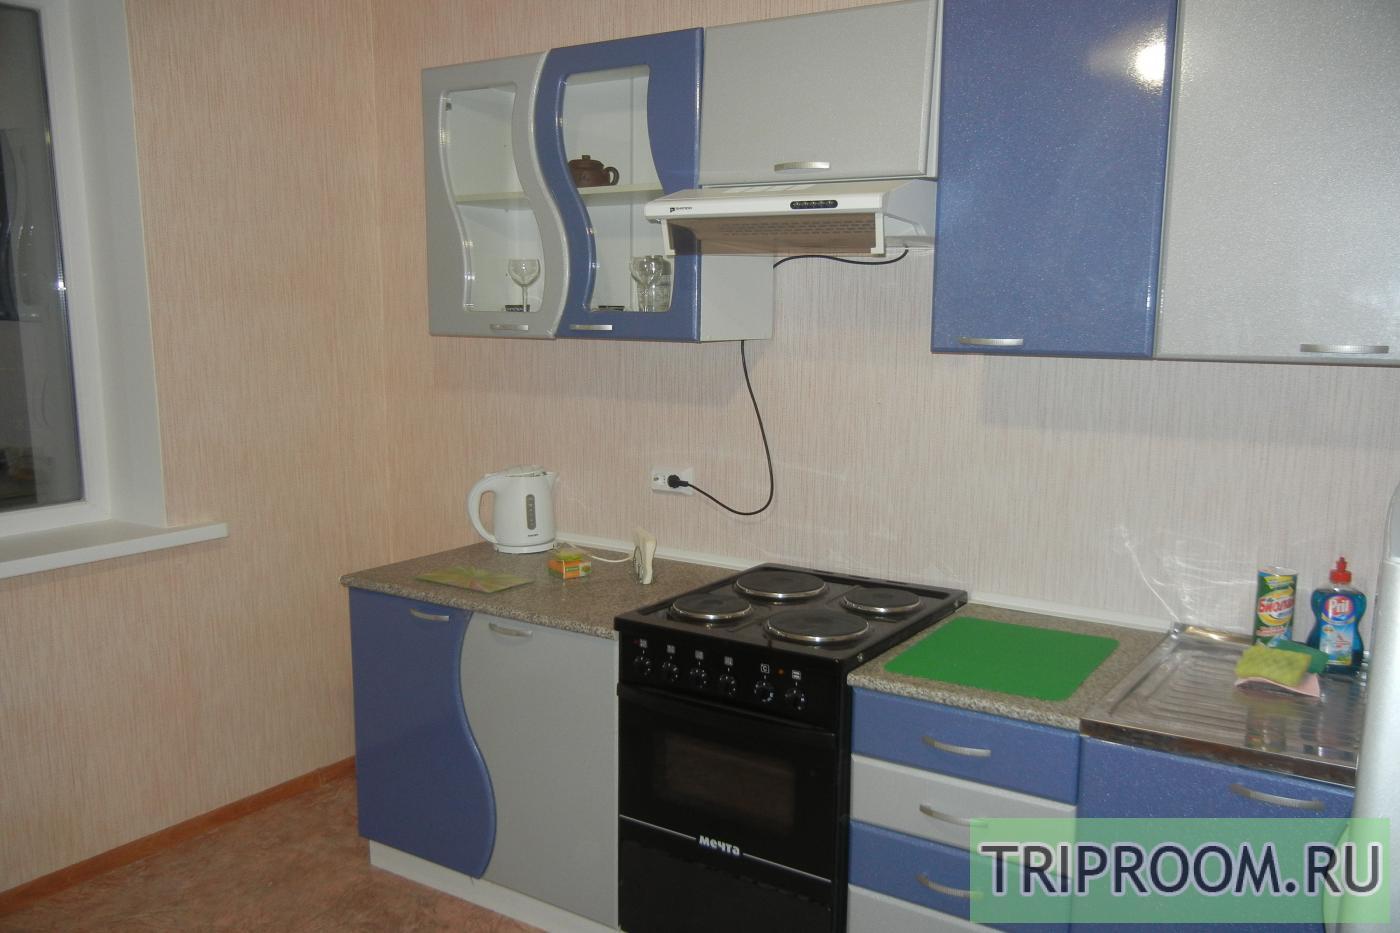 2-комнатная квартира посуточно (вариант № 13501), ул. Пеше-стрелецкая улица, фото № 7